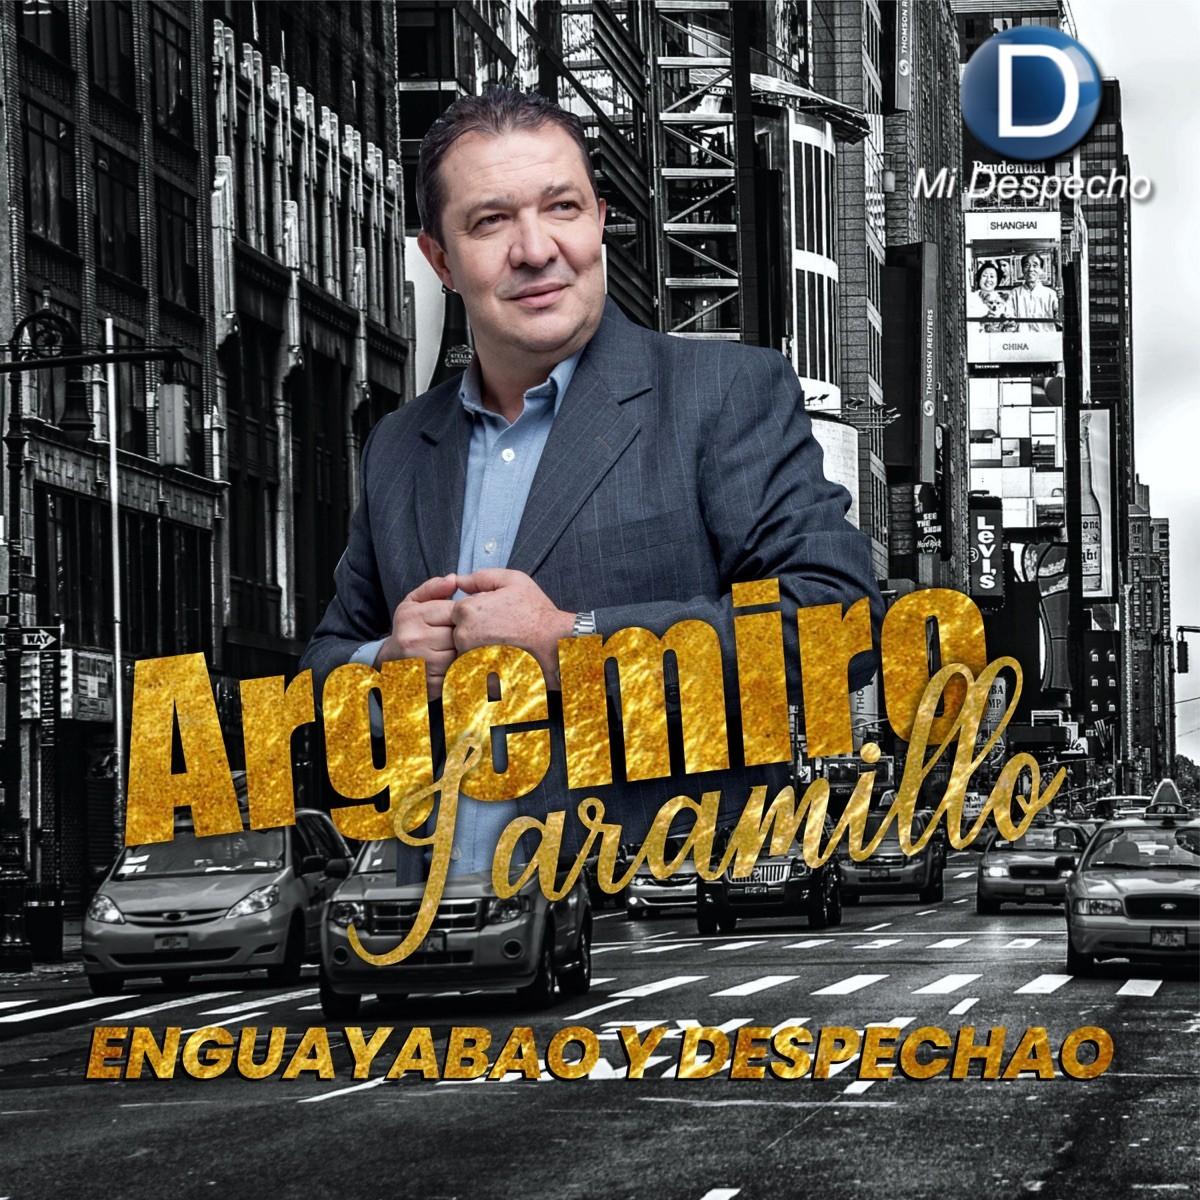 Argemiro Jaramillo Enguayabao y Despechao Frontal